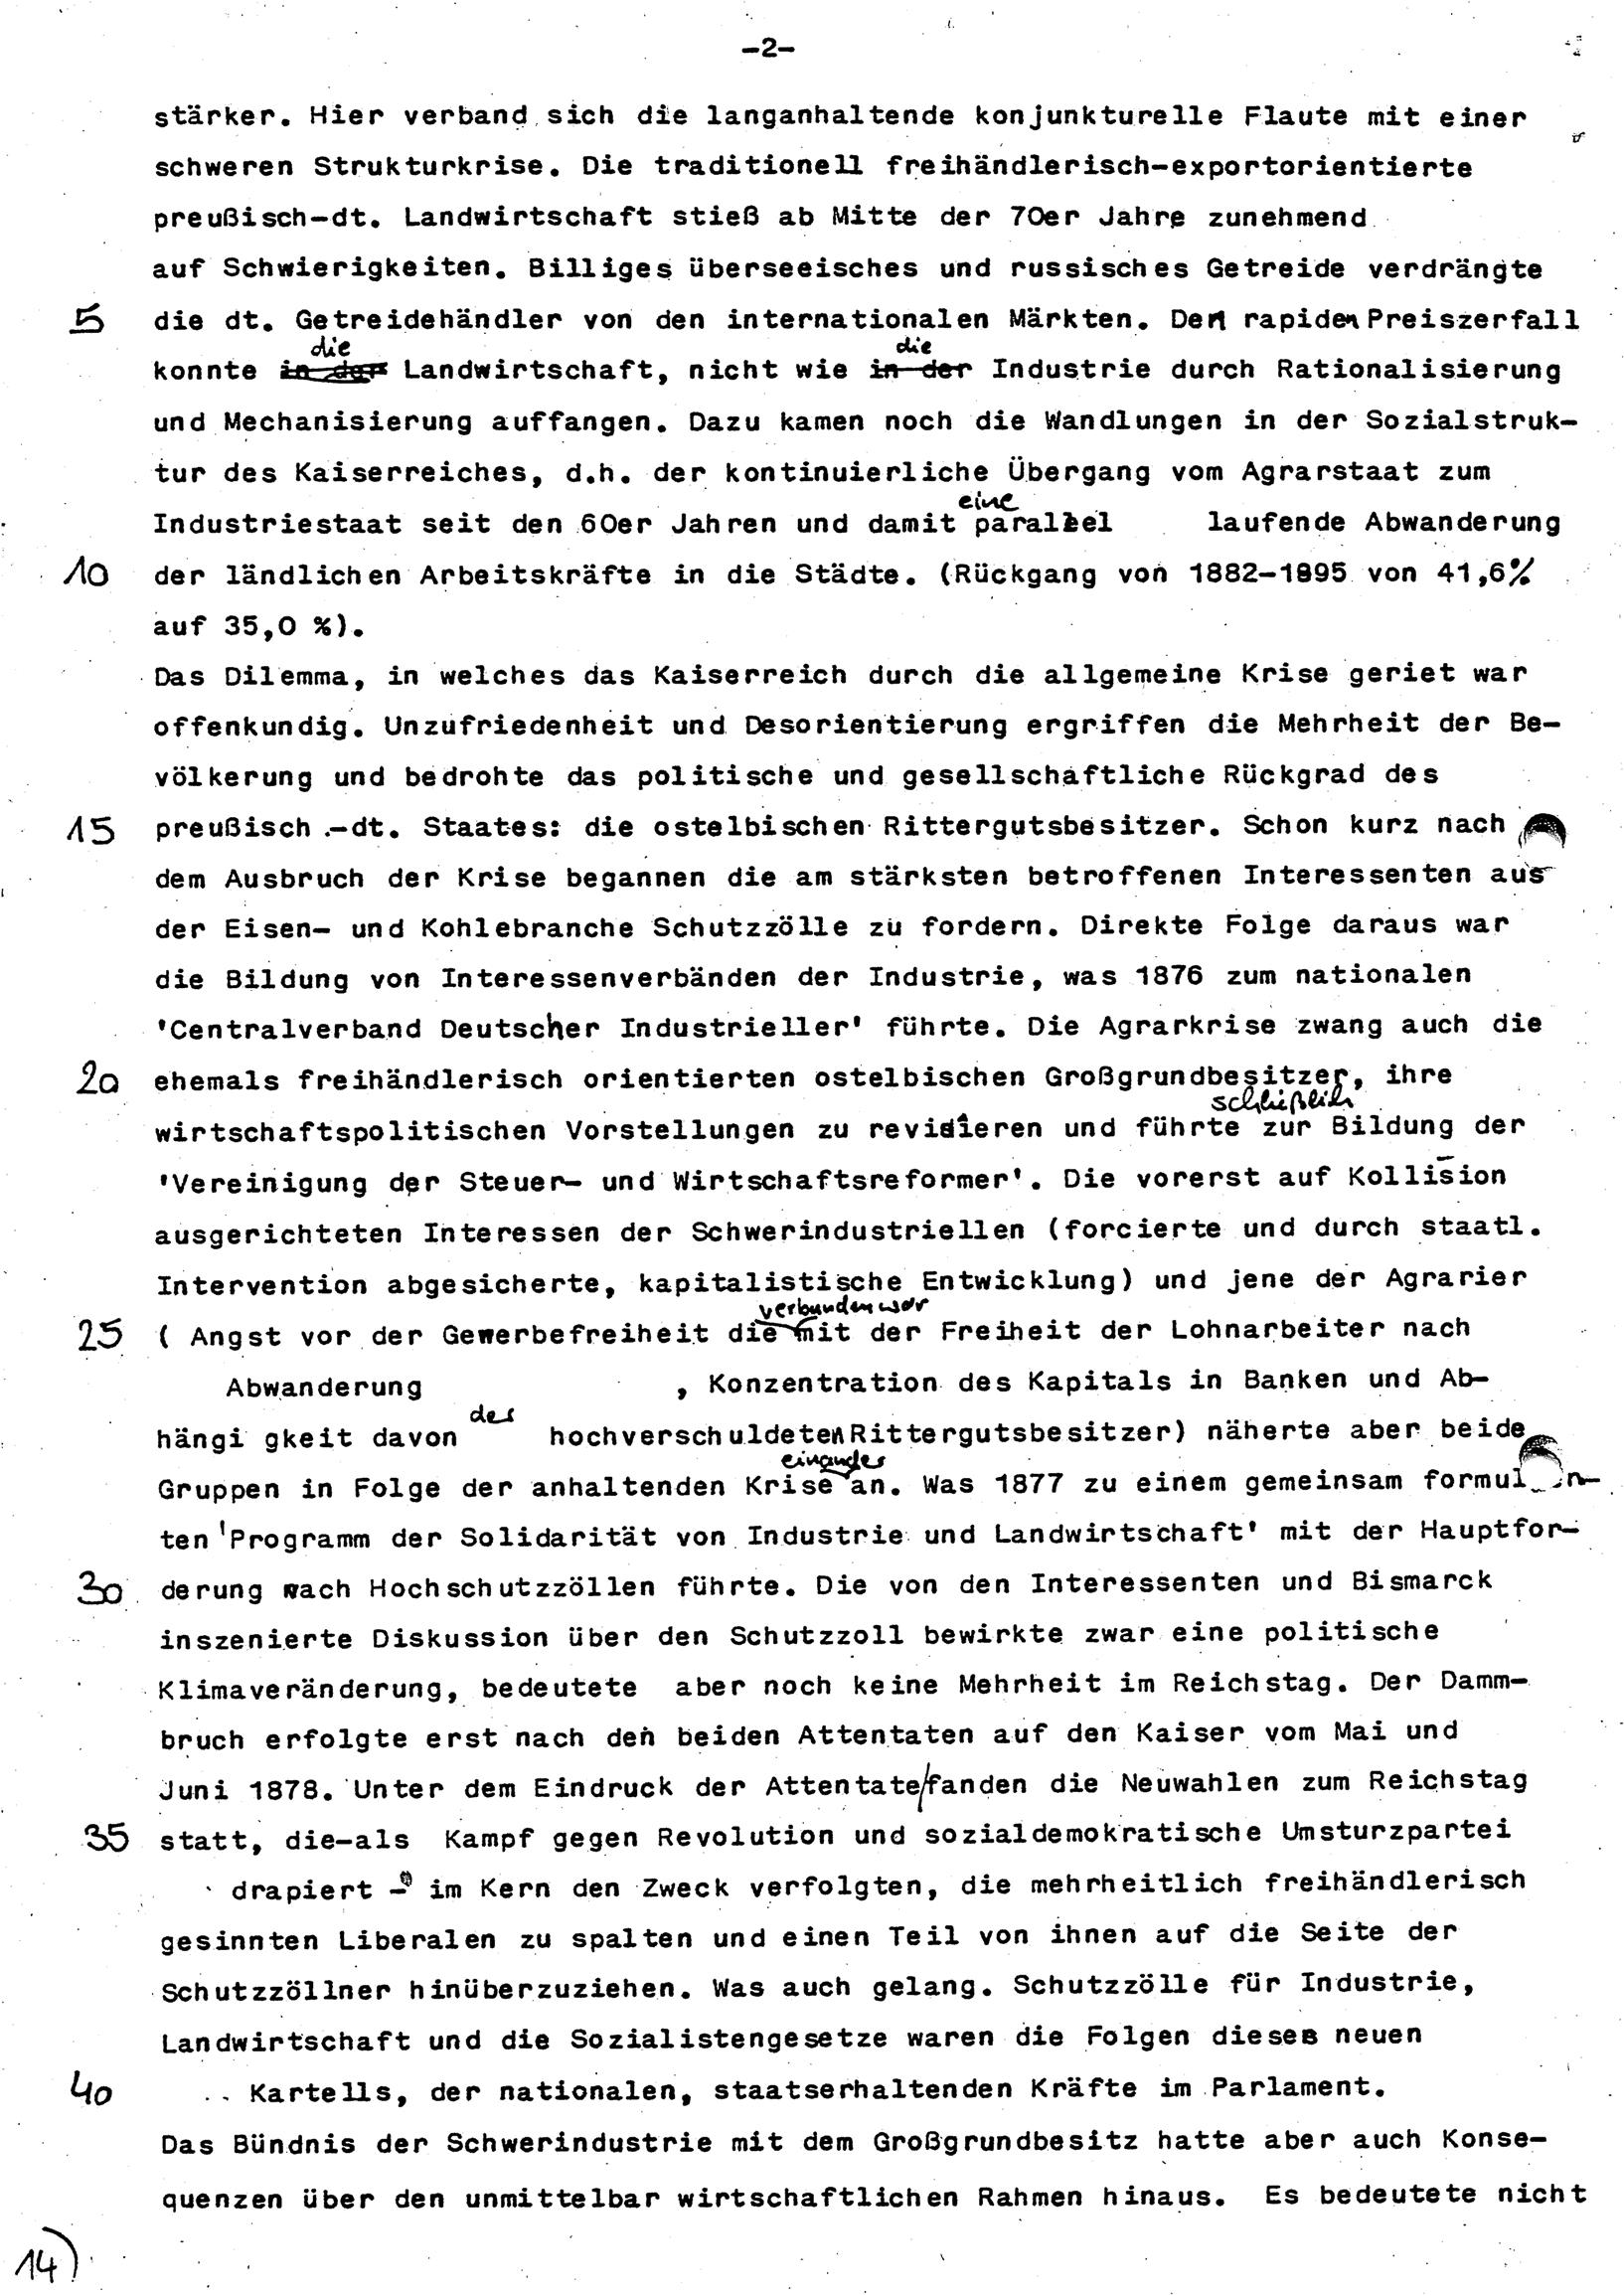 Ulm_KGU_Arbeitsheft_19830425_015_017